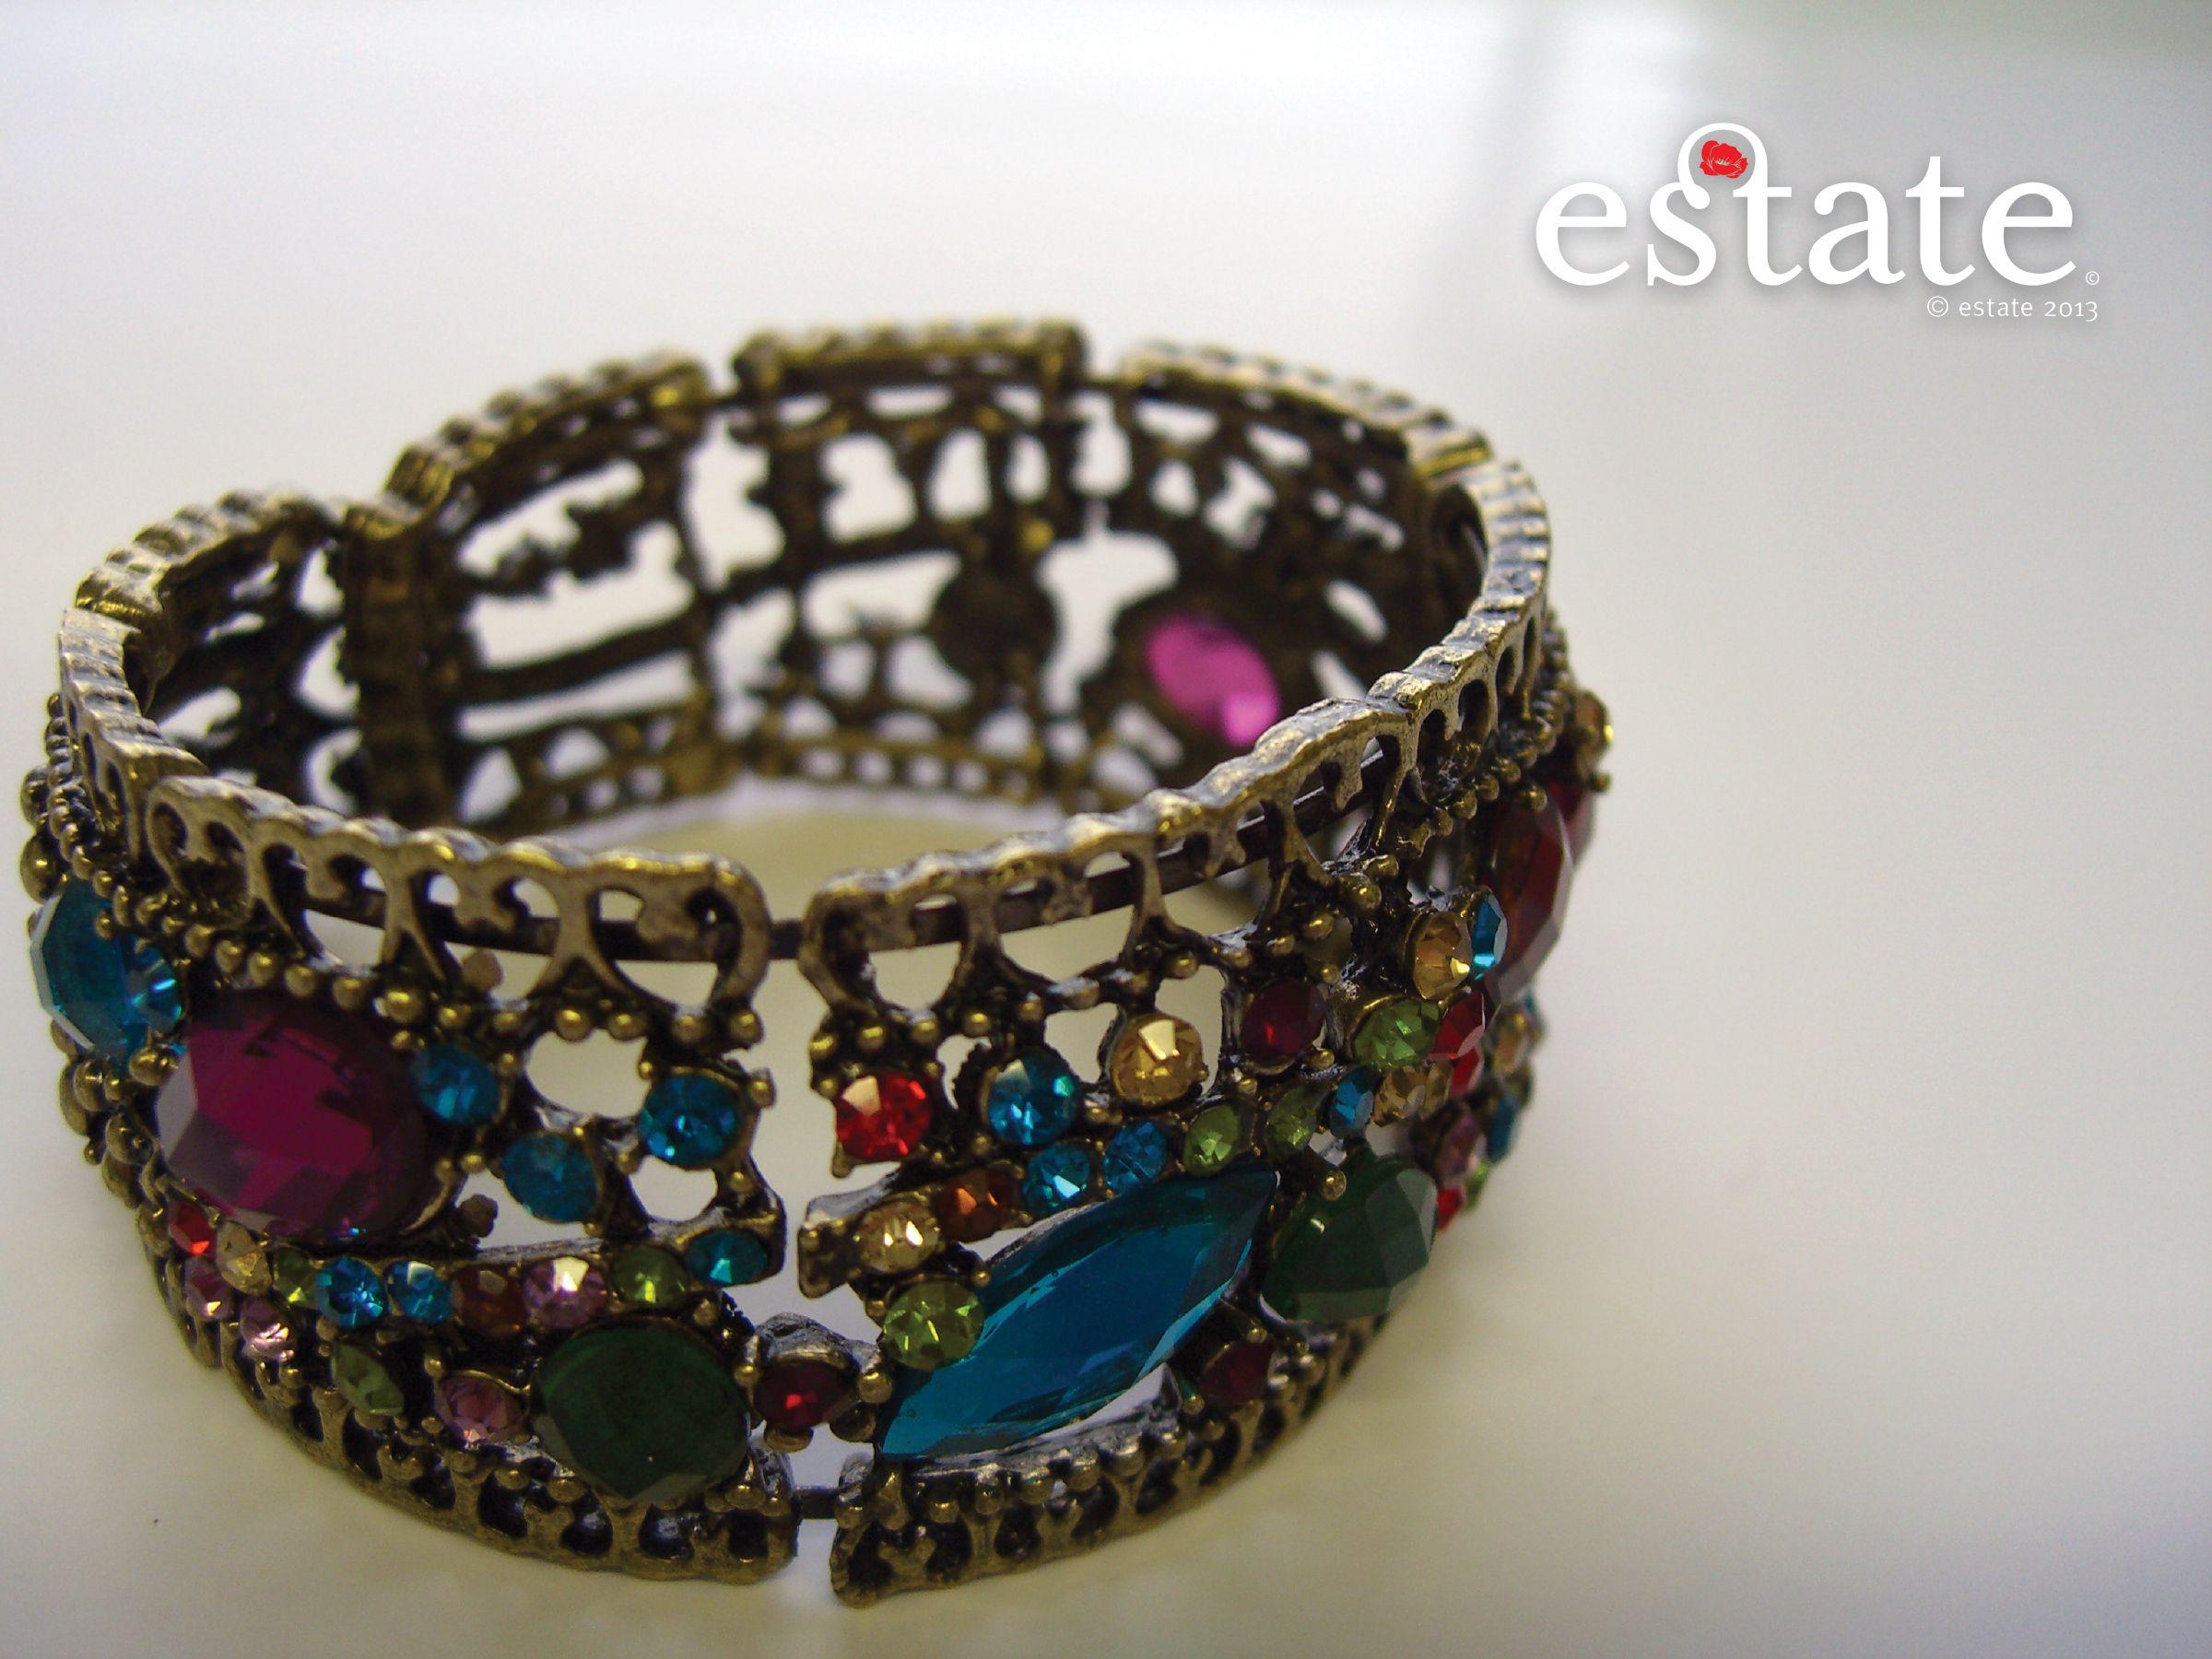 Make this elegant jeweled bracelet yours for $10